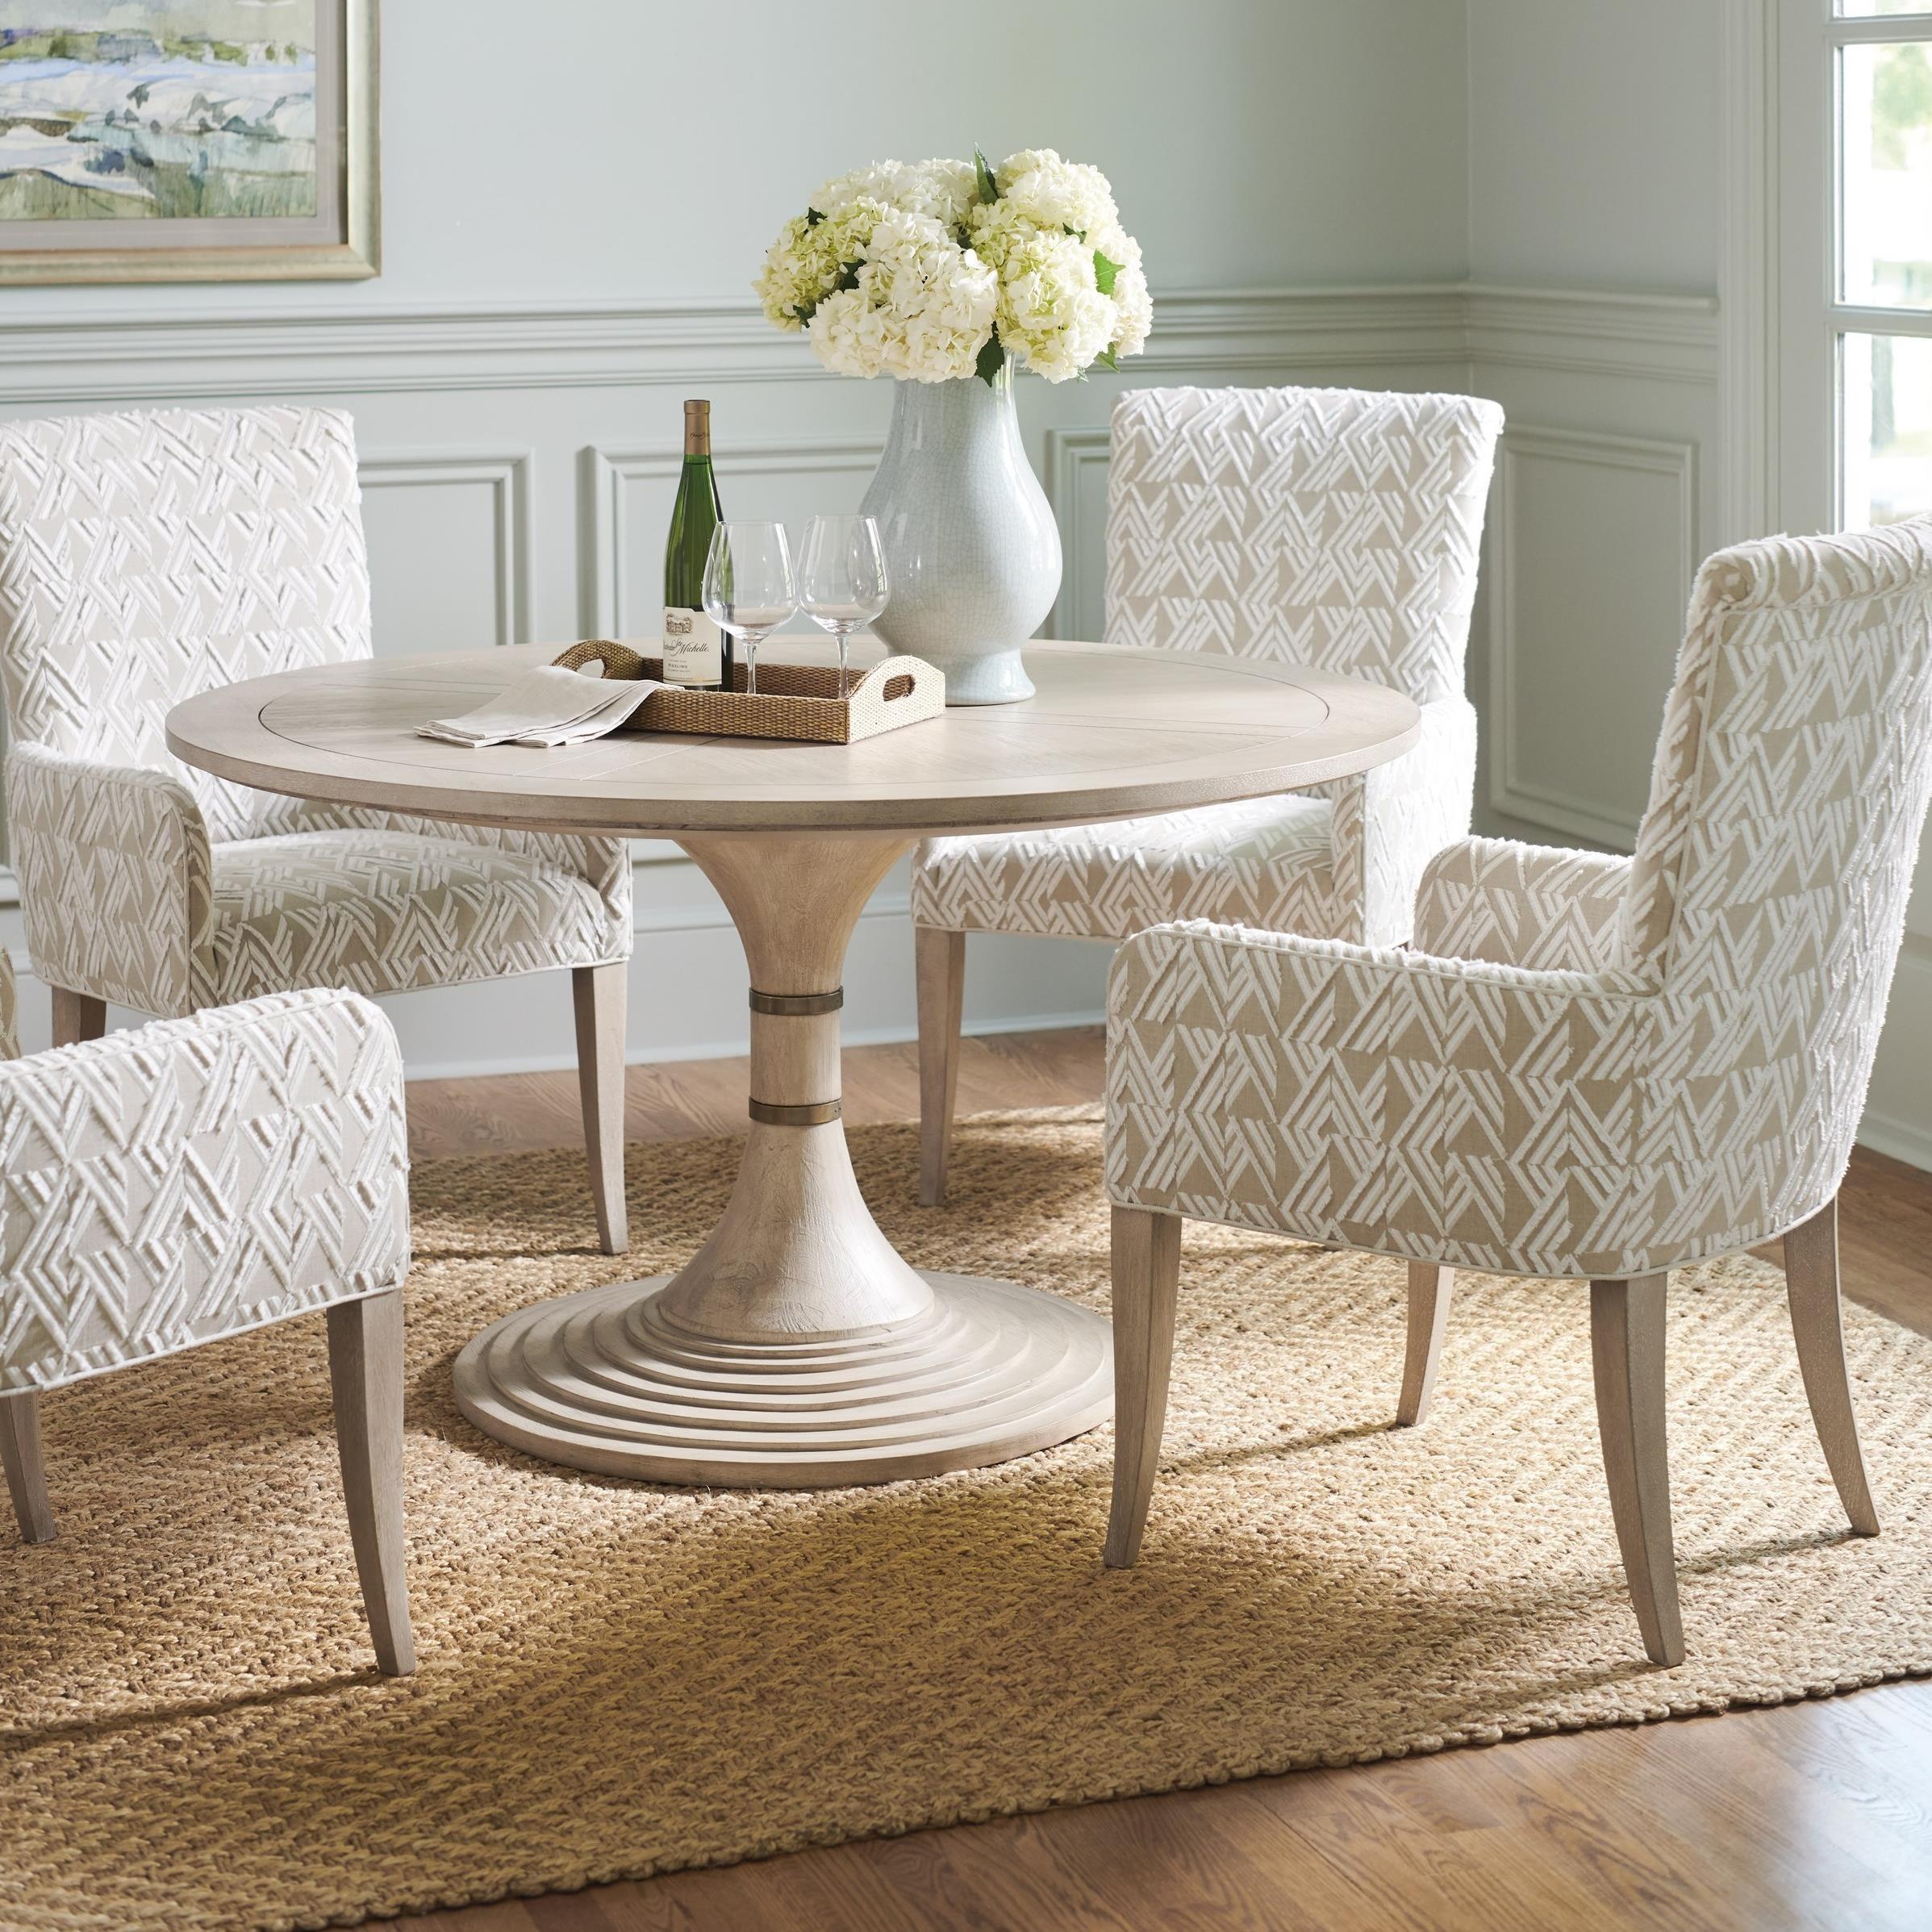 Malibu 5-Piece Dining Set with Topanga Table by Barclay Butera at Baer's Furniture